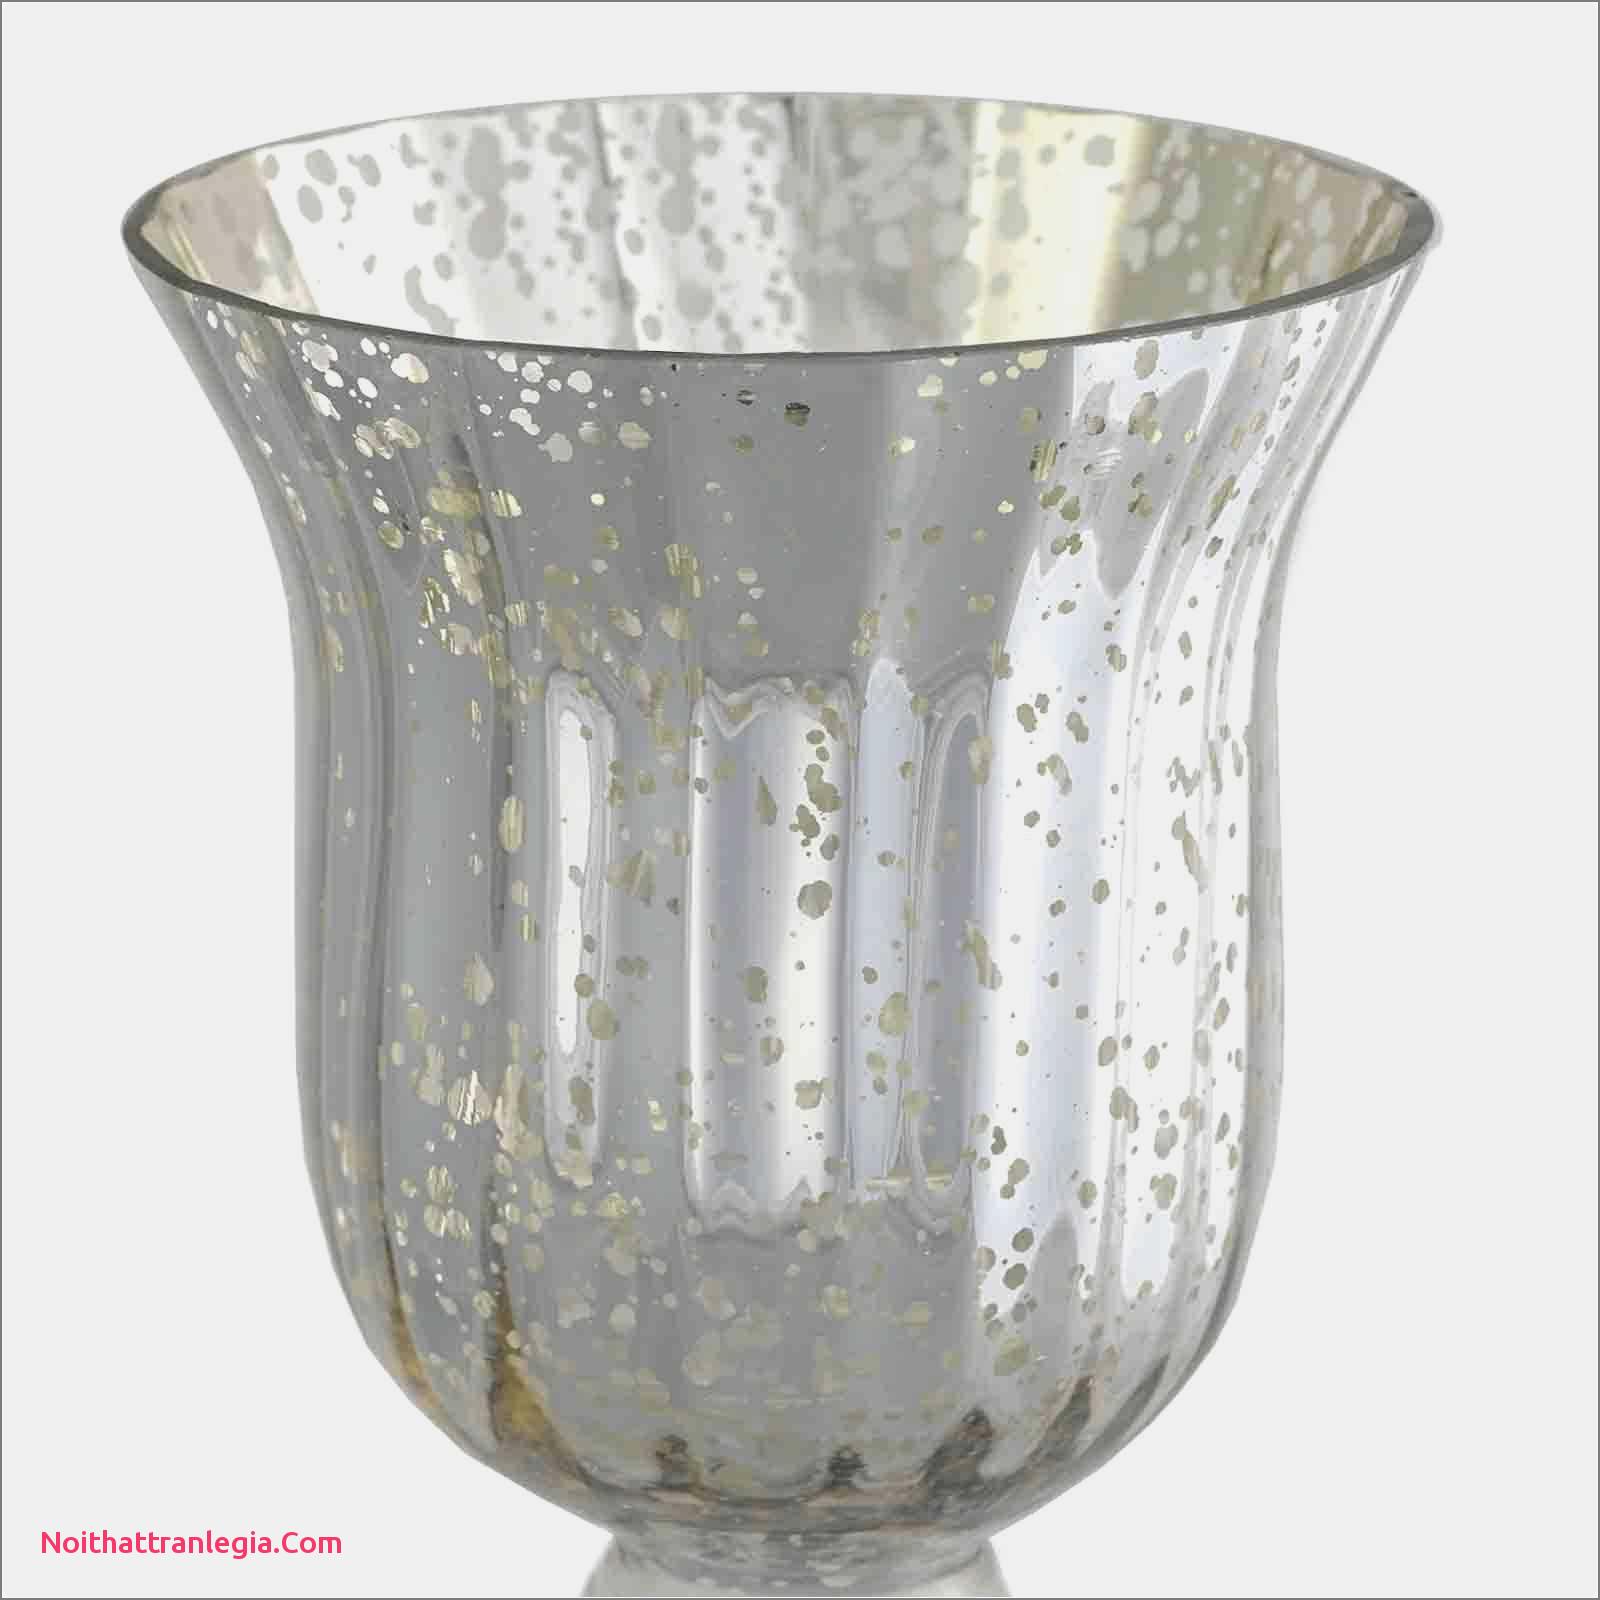 18 cylinder vases wholesale of 20 wedding vases noithattranlegia vases design intended for wedding guest gift ideas inspirational candles for wedding favors superb pe s5h vases candle vase i